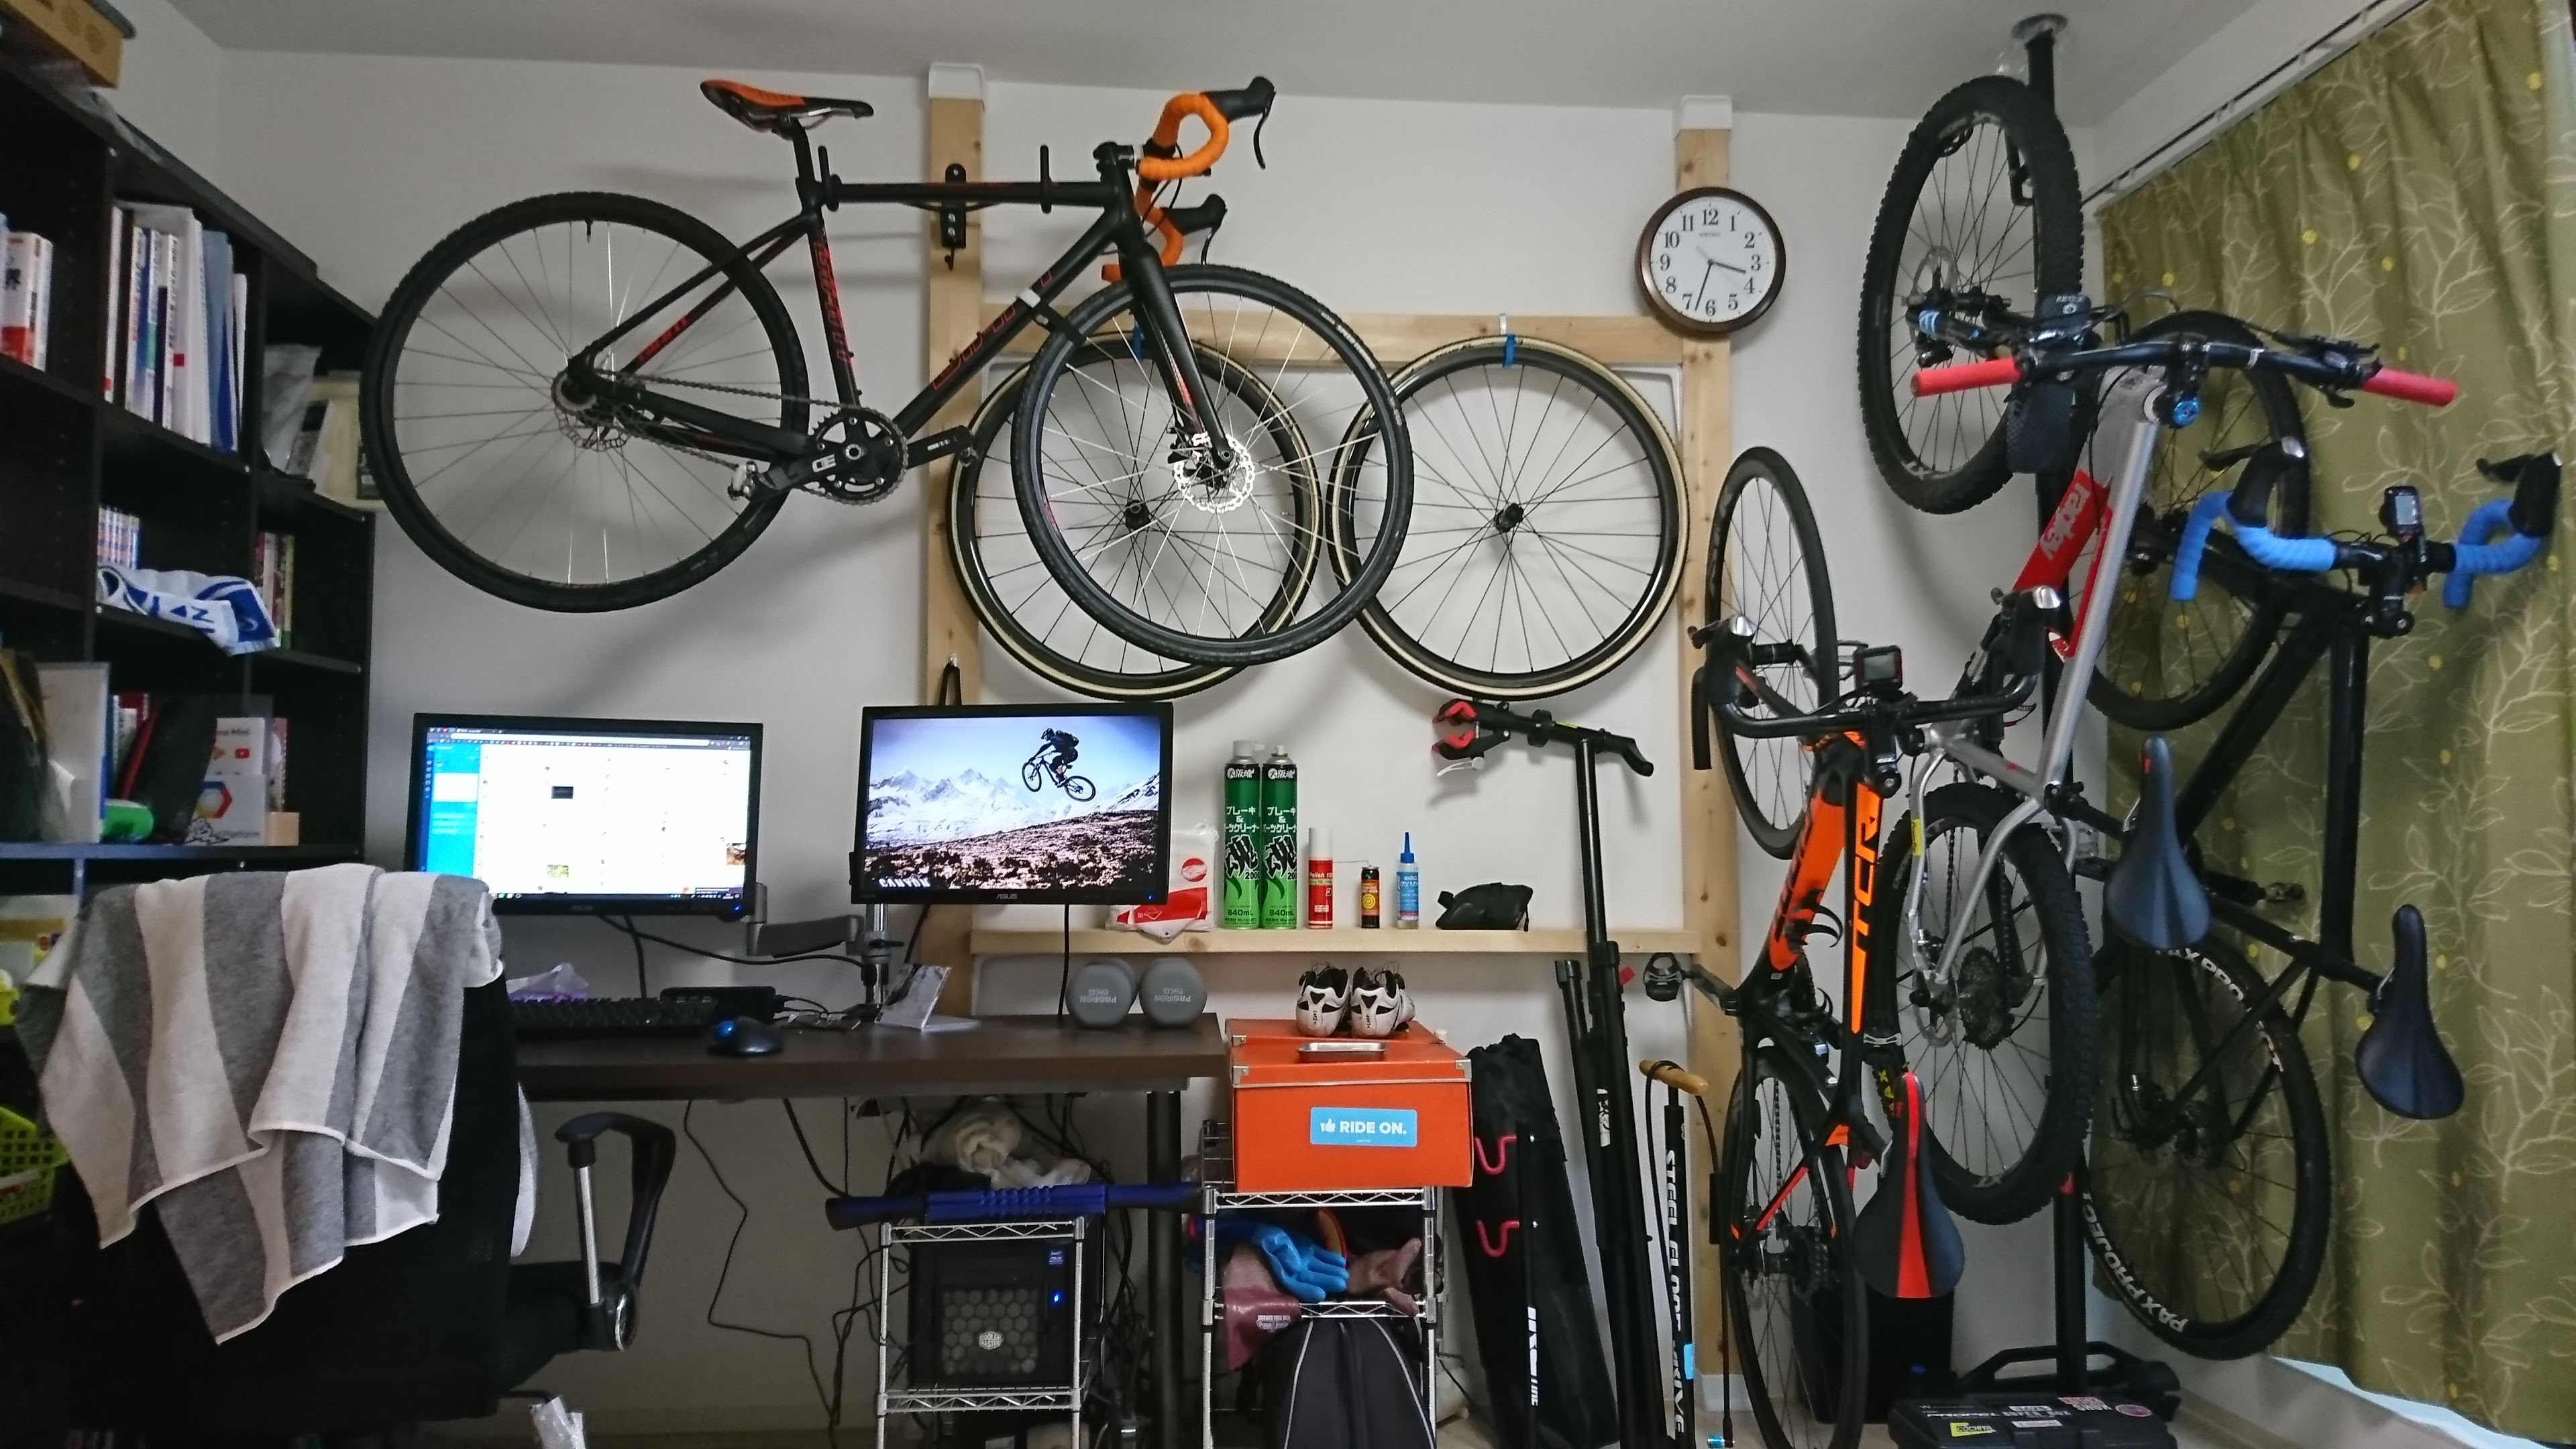 2x4材で自転車用品を省スペース収納